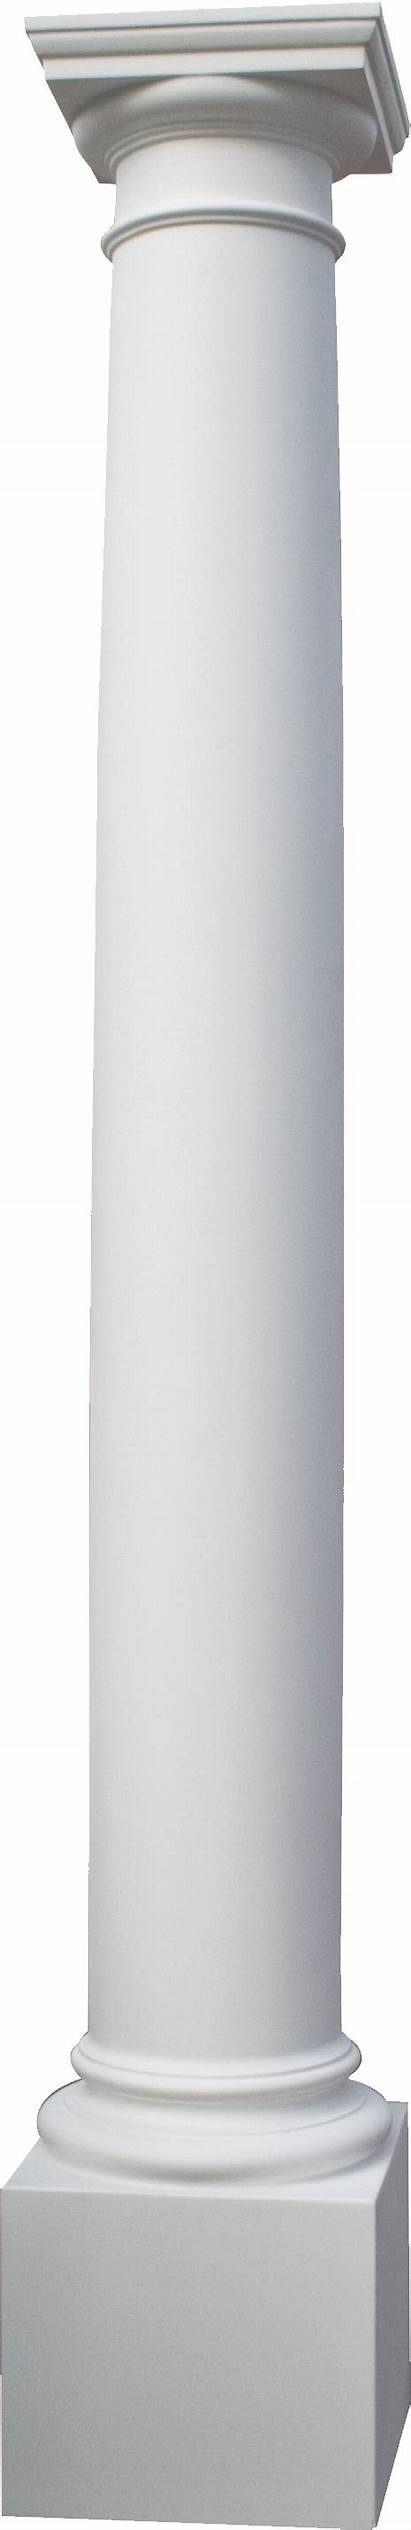 Column Transparent Background Pngimg